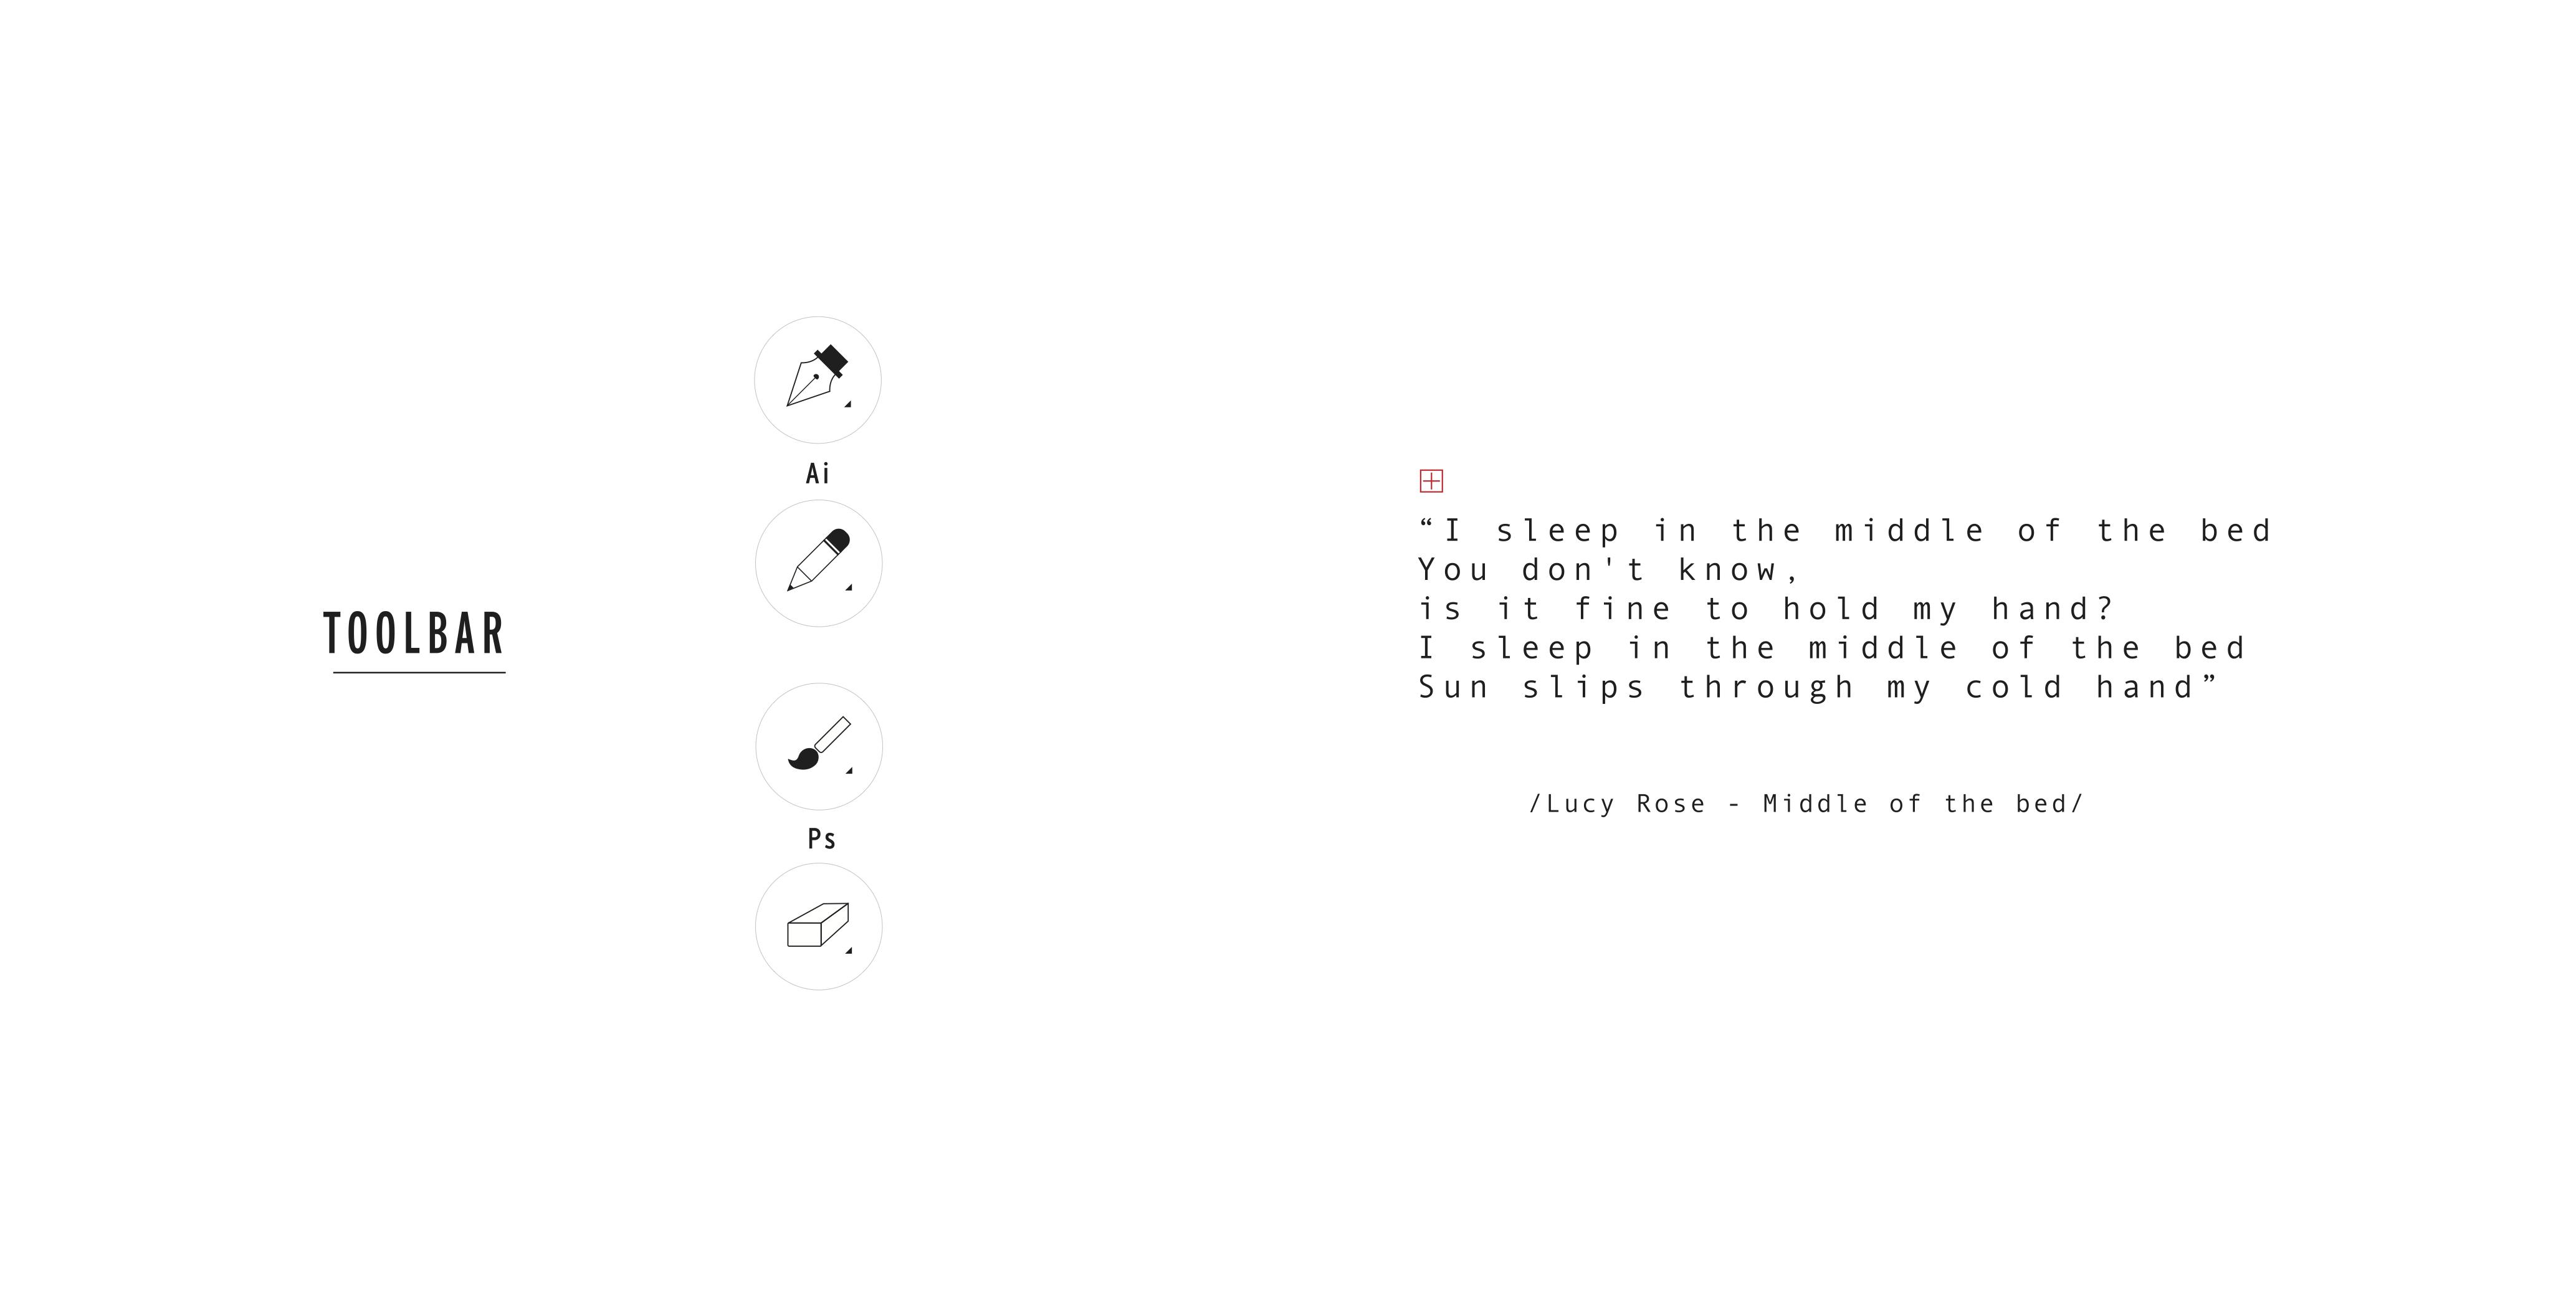 lyrics_MiddleOftheBed